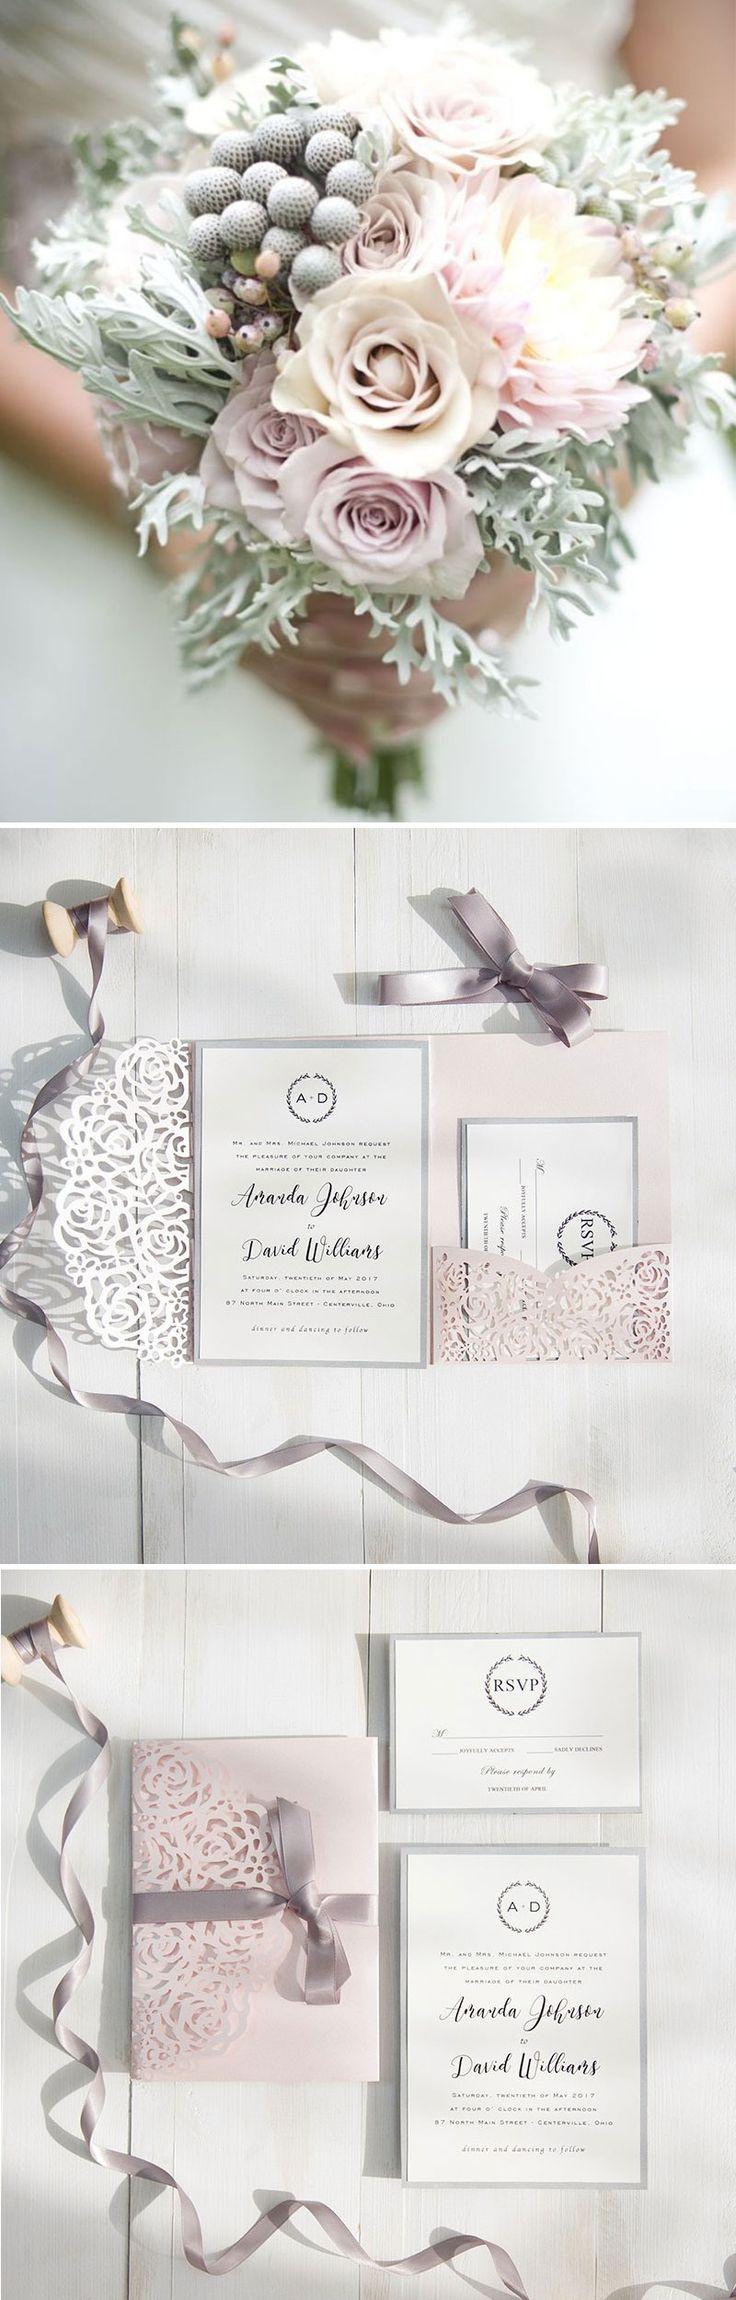 Blush Pink And Gray Laser Cut Pocket Wedding Invitations SWWS040